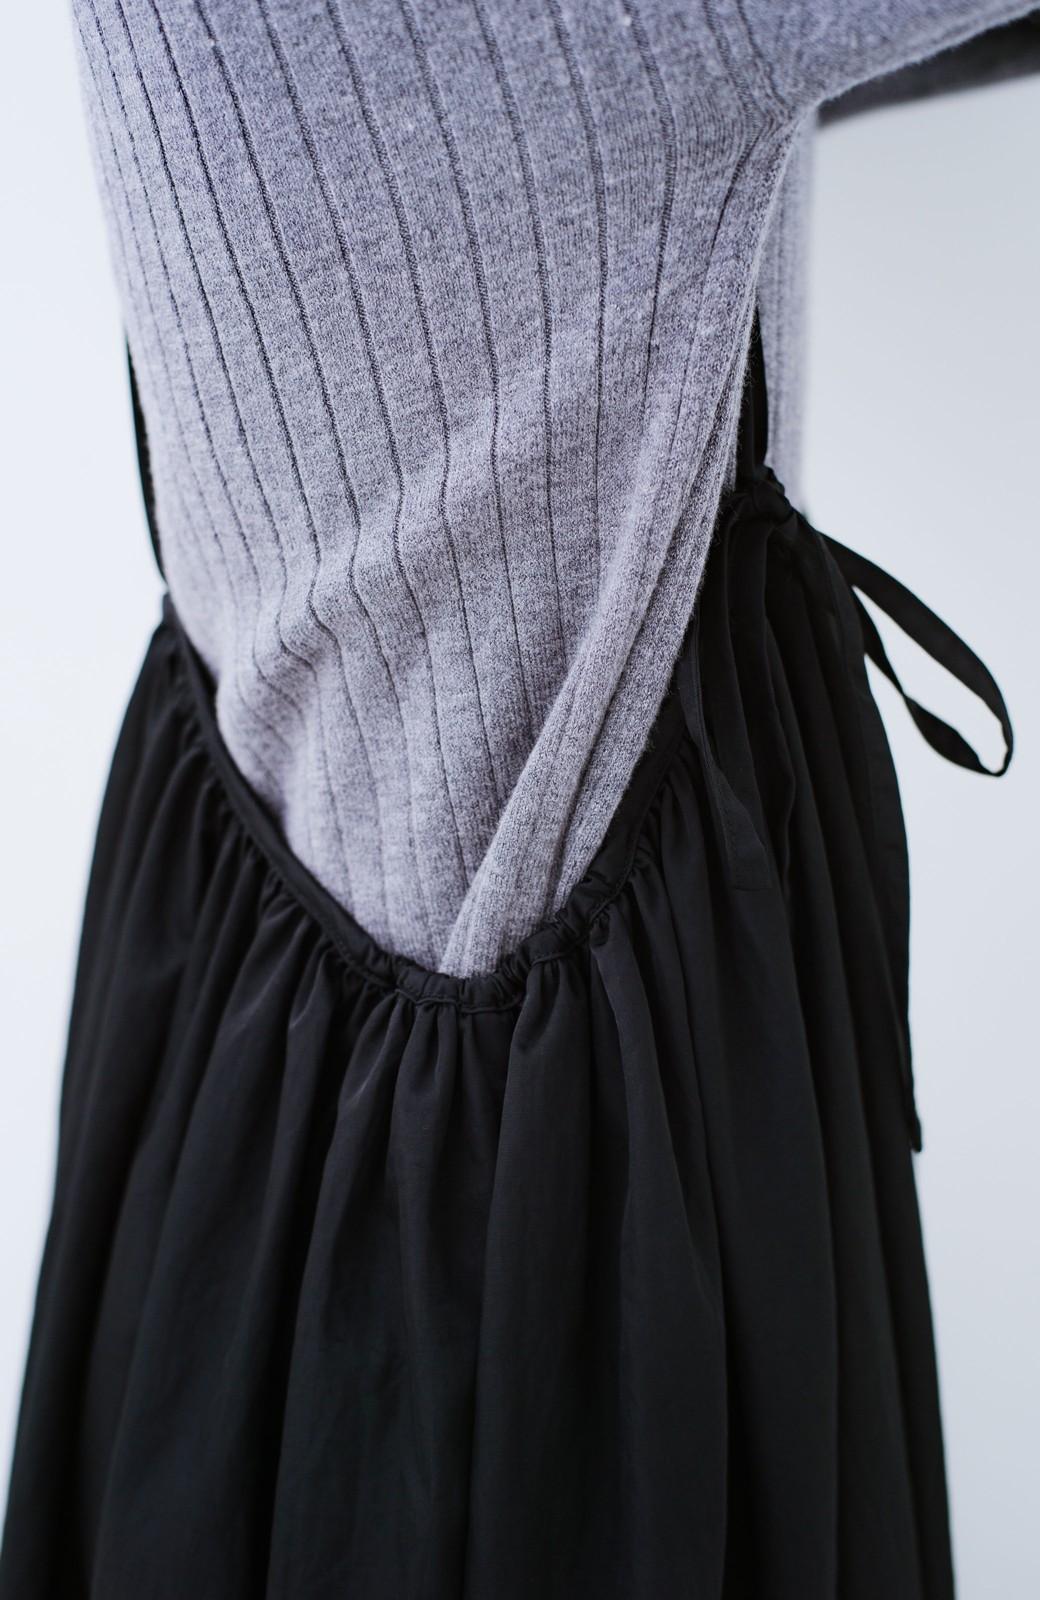 haco! 女の子バンザイ!プロジェクト【ブルー期】 ニットですら重ね着できる安心さ ゆったりギャザーキャミワンピ <ブラック>の商品写真4